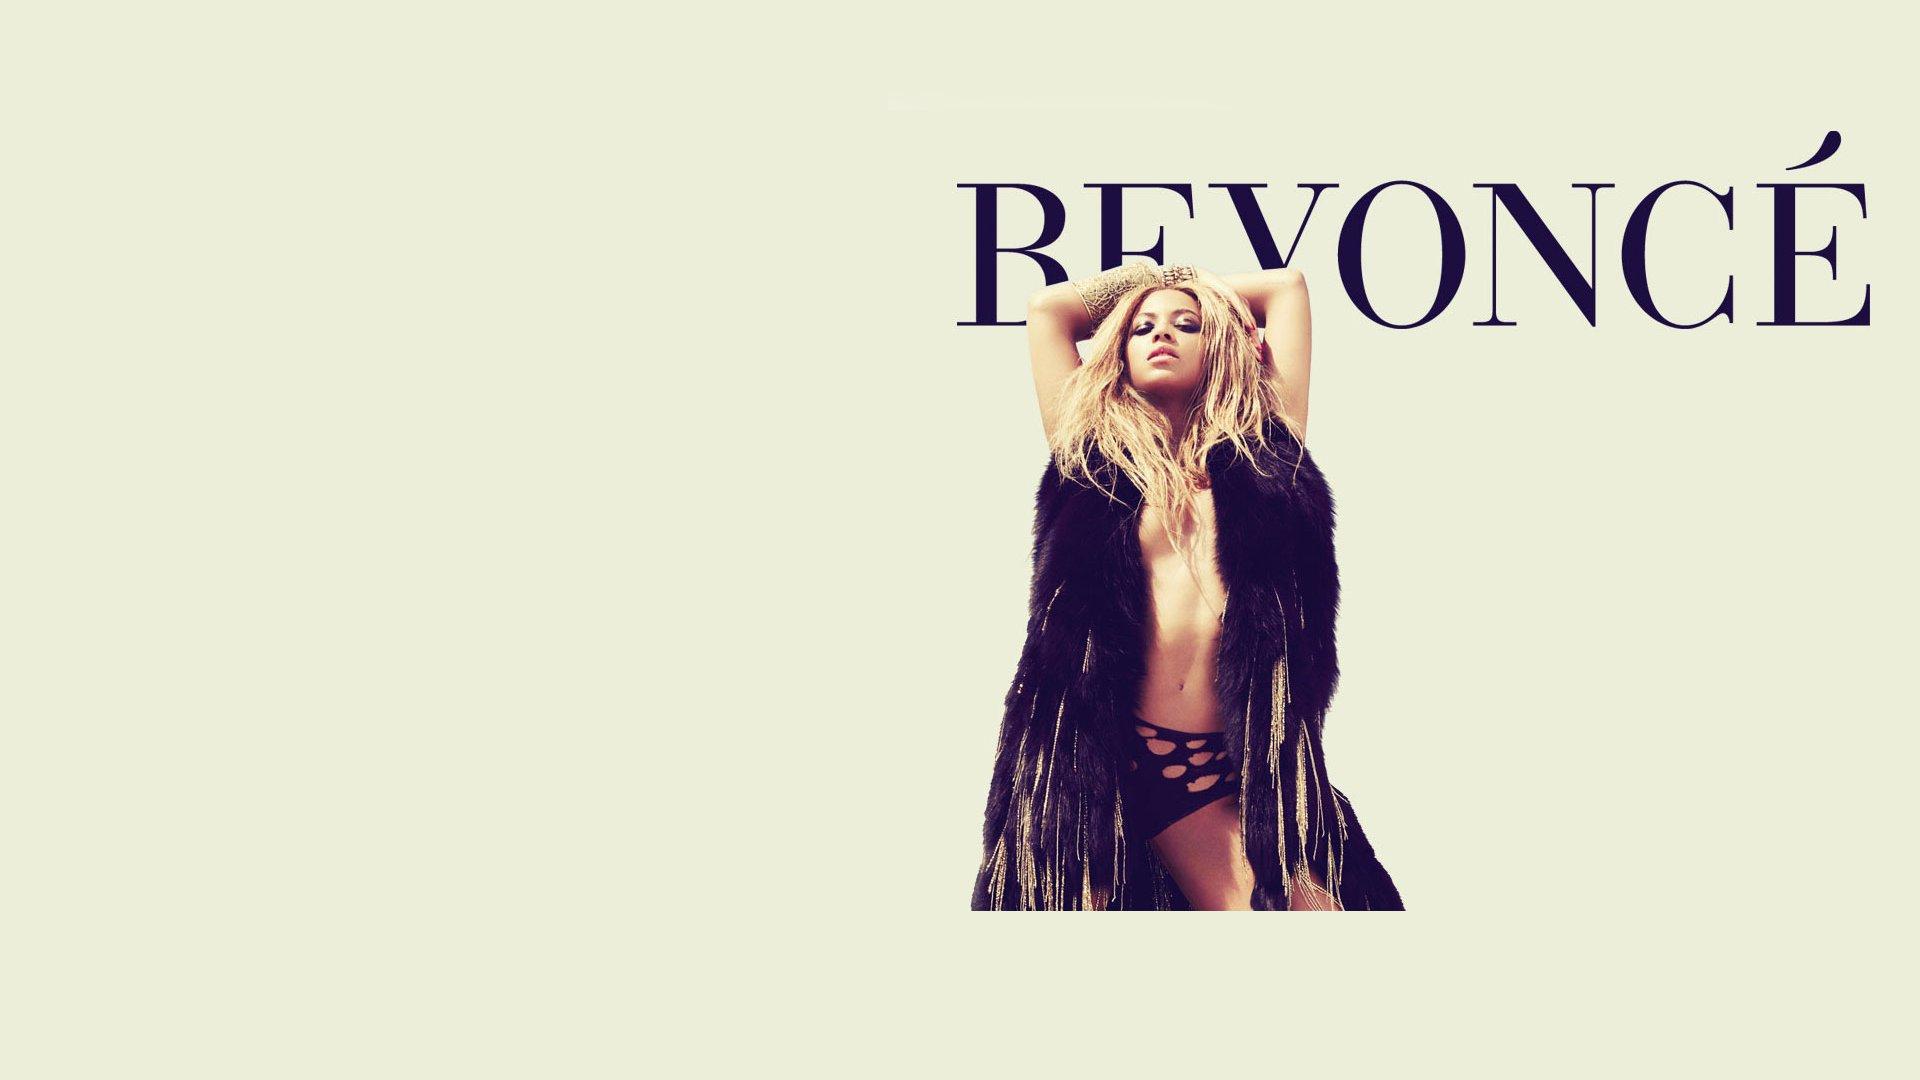 wallpapers - Beyonce Wallpaper (23337637) - Fanpop